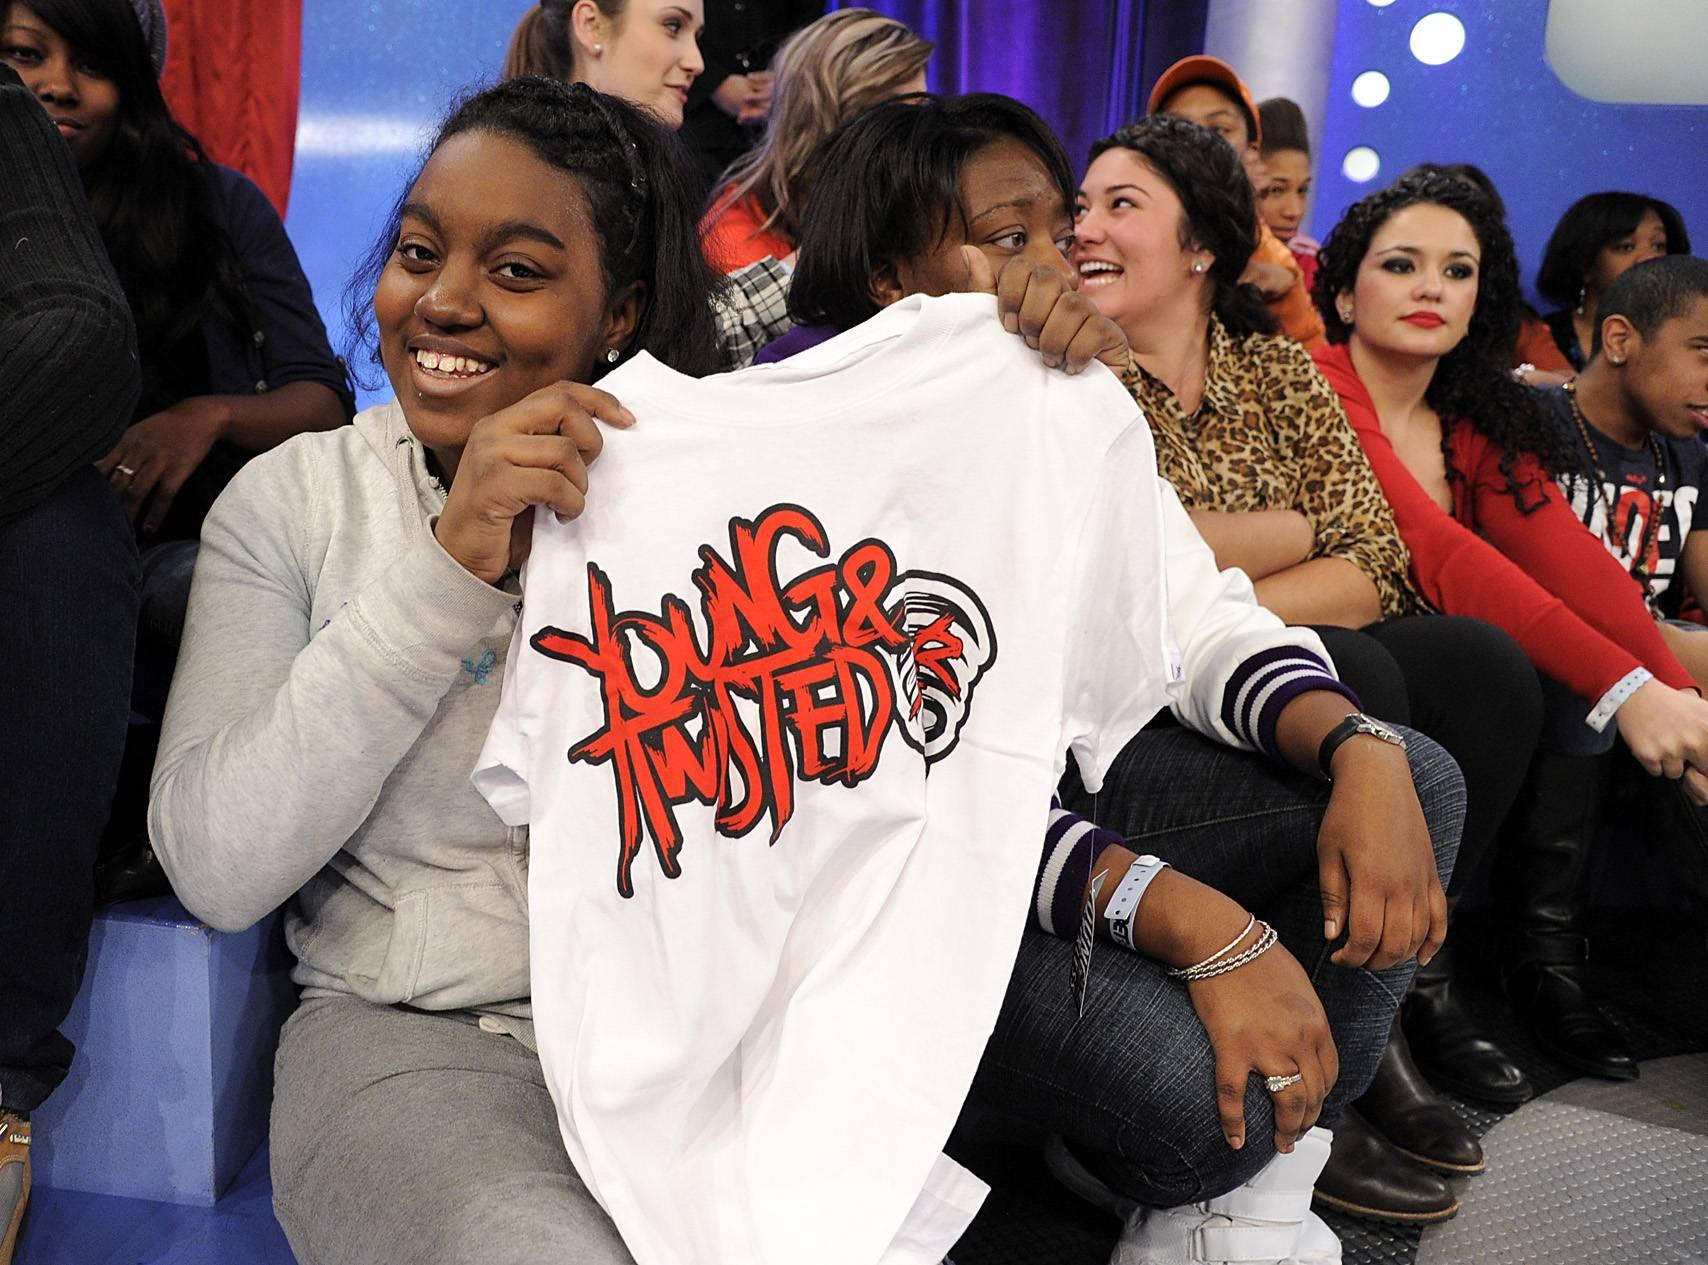 Nice Shirt - Fan displays Lil Twist shirt given to audience members at 106 & Park, January 05, 2012. (Photo: John Ricard/BET)